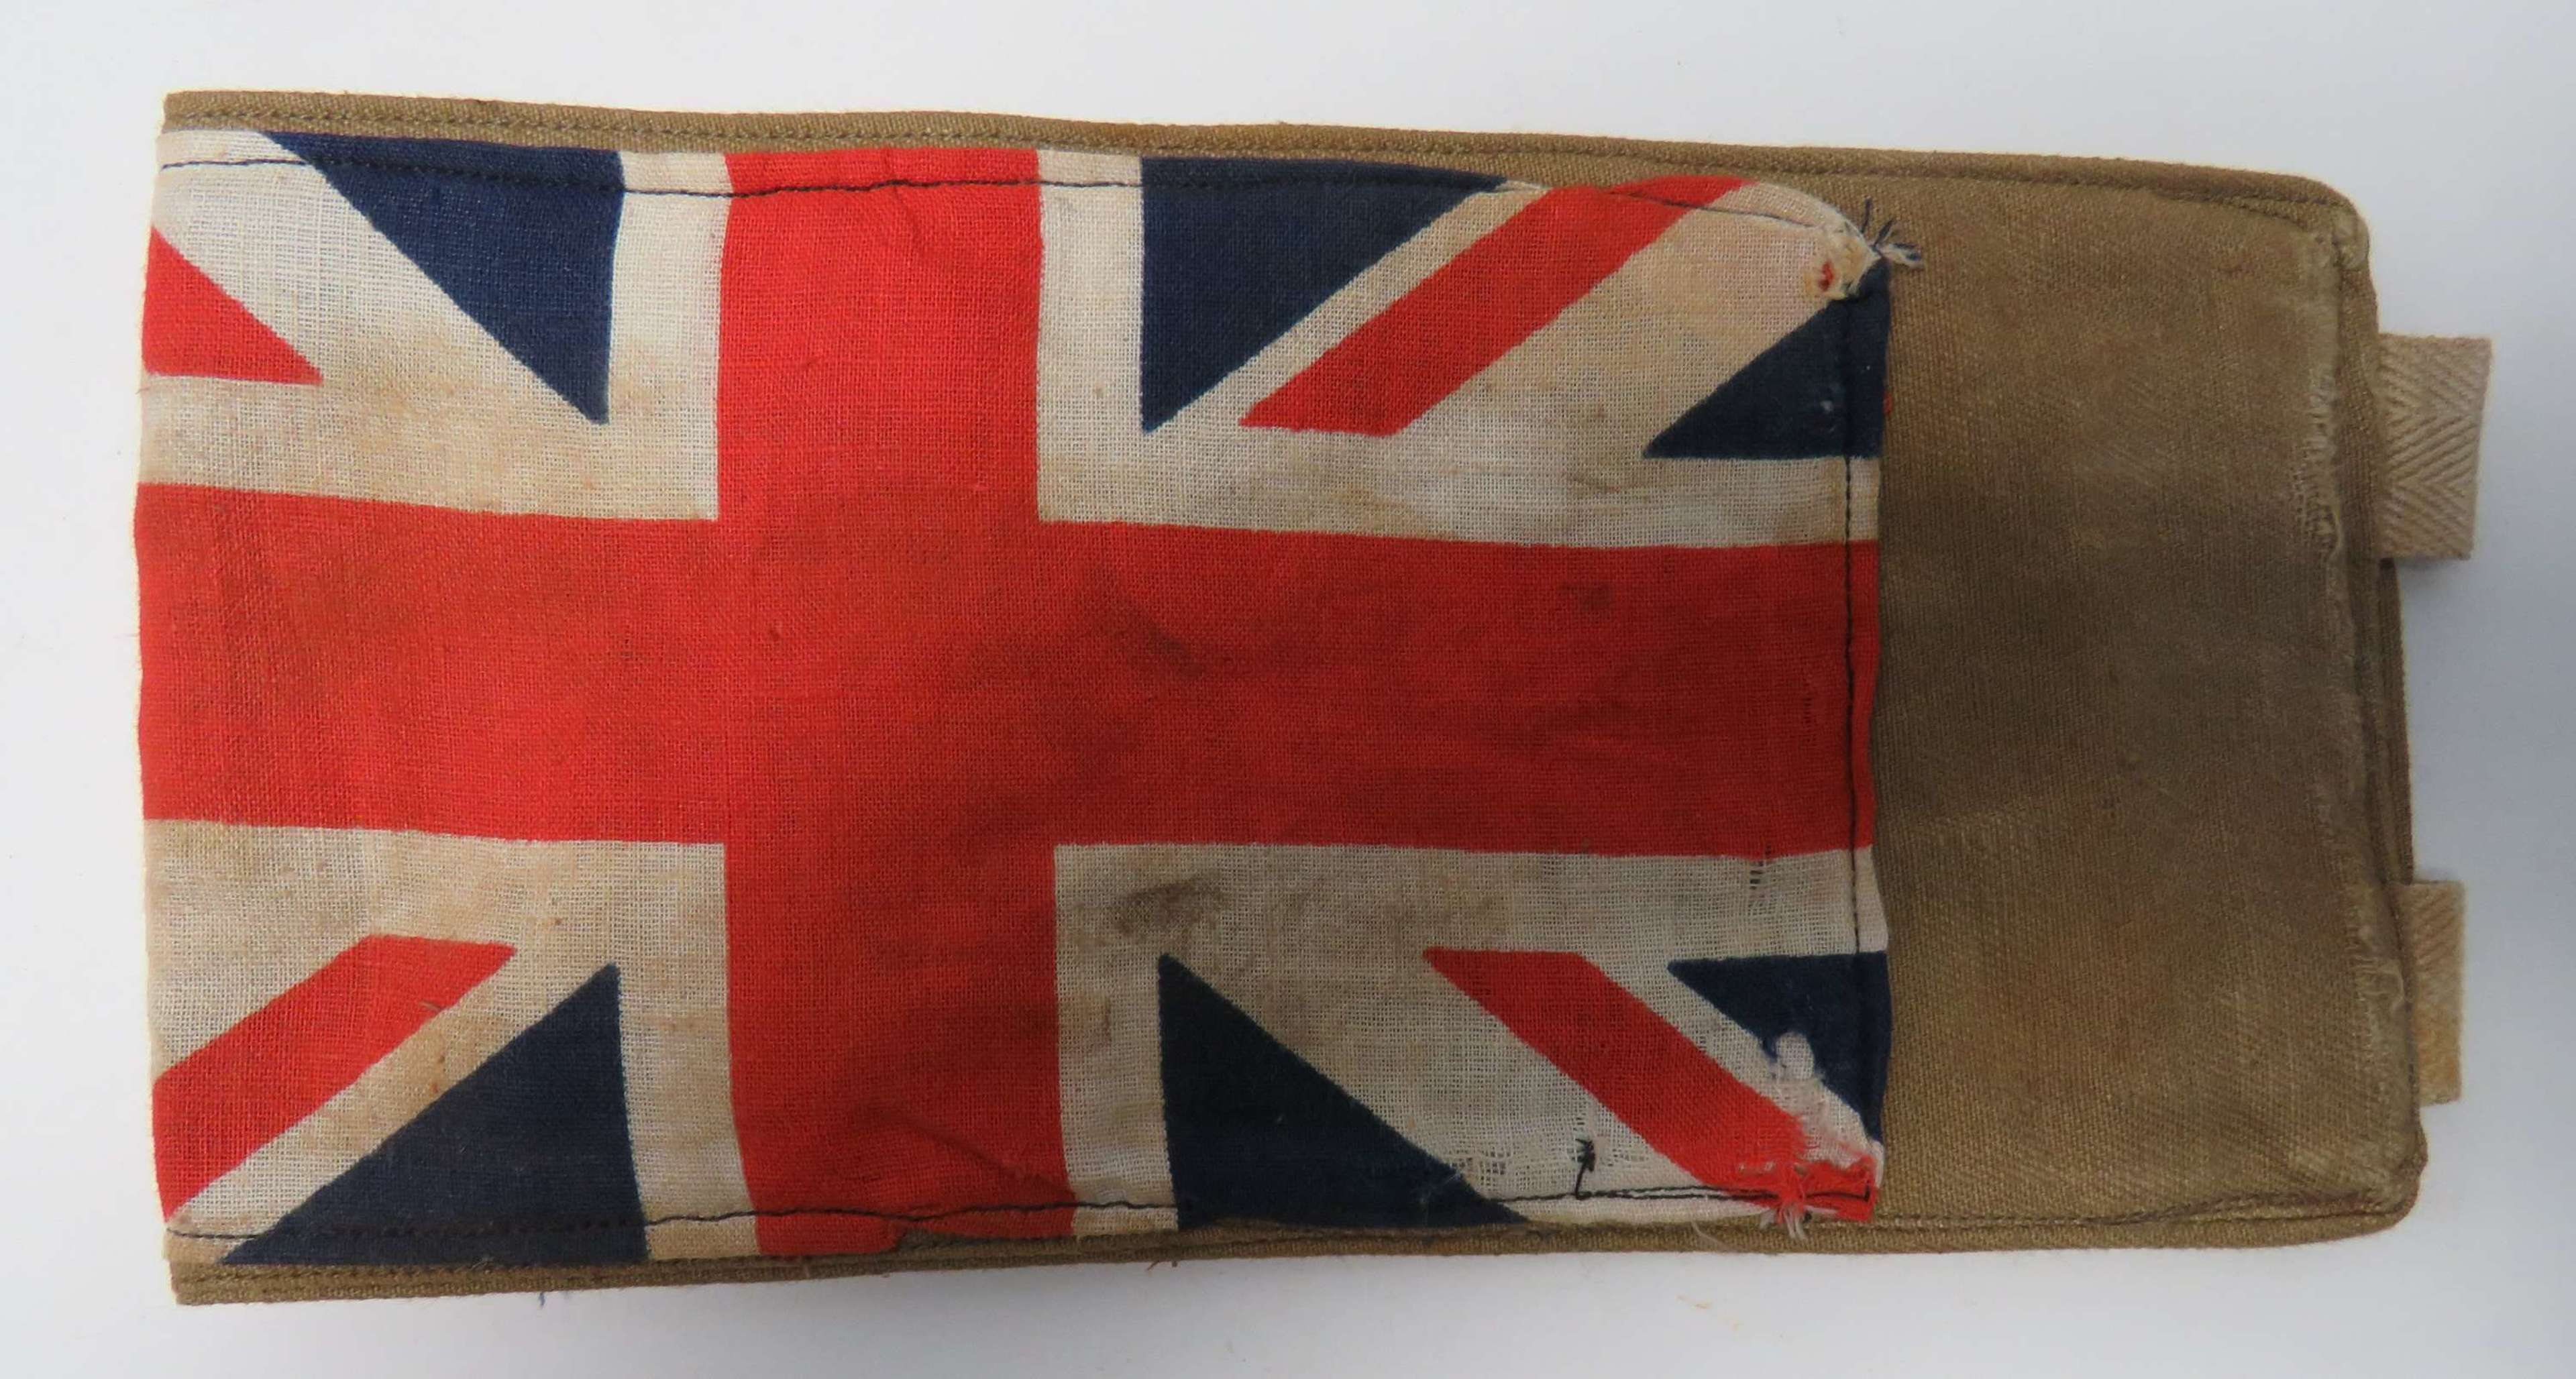 WW2 Dated Airborne Invasion Union Jack Armband